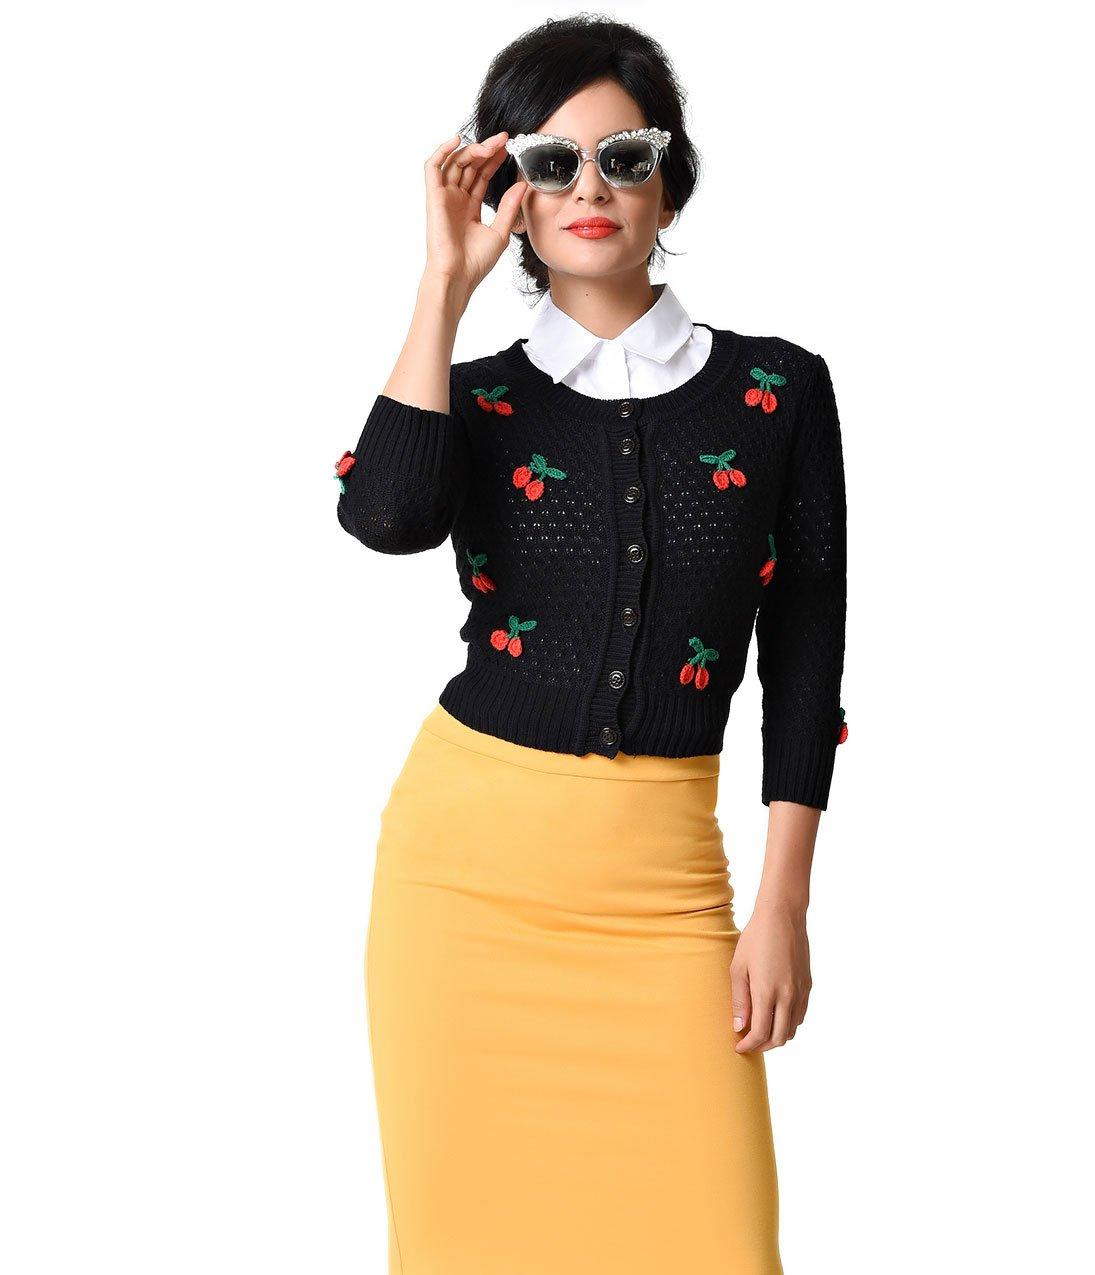 Vintage Style Black & Red Cherry Three-Quarter Sleeve Knit Crop Cardigan